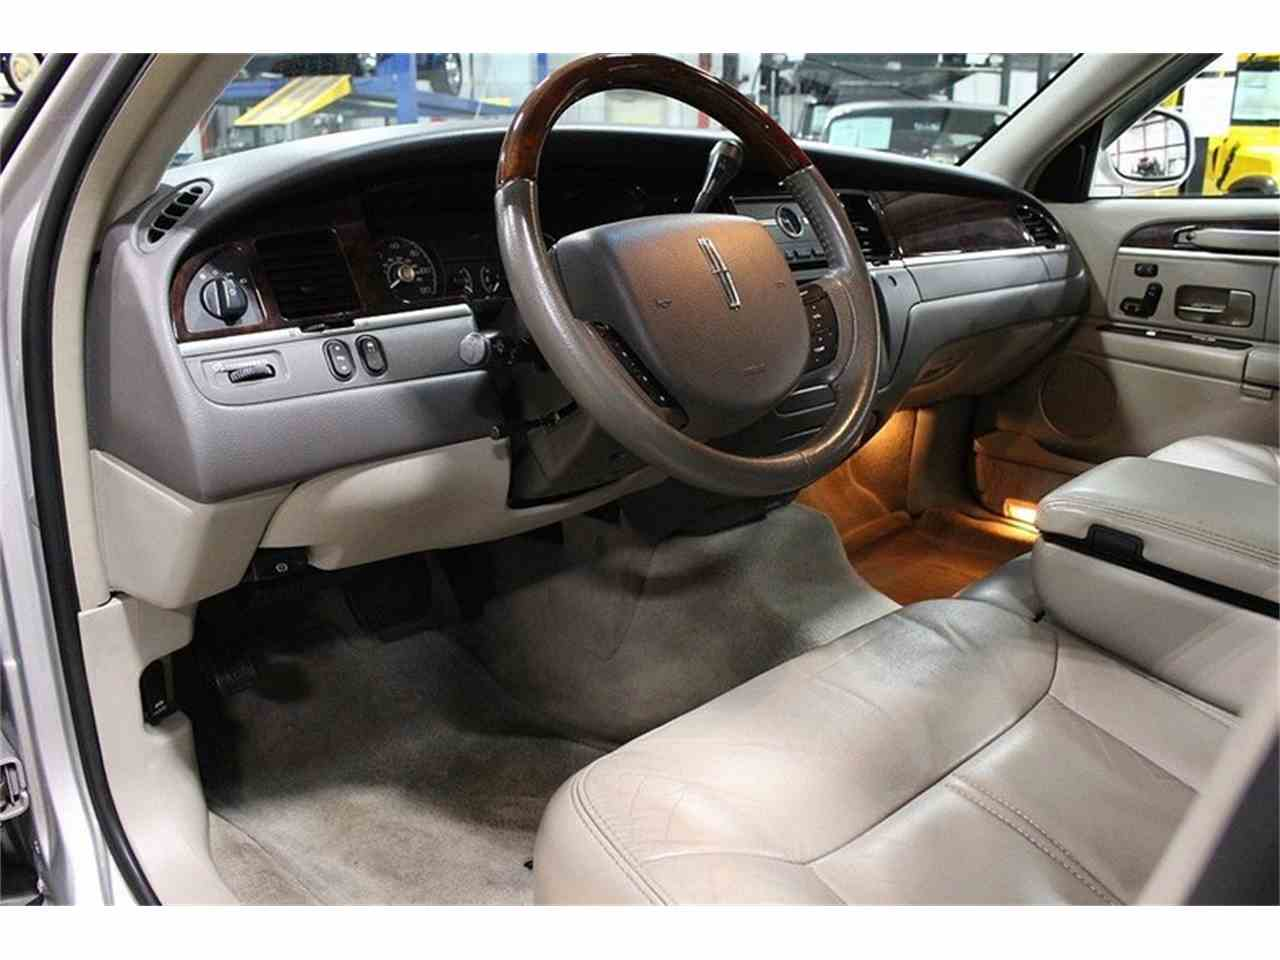 view s auctions title left car online salvage auto in orleans black town copart on lincoln sale new of carfinder cert la lot en